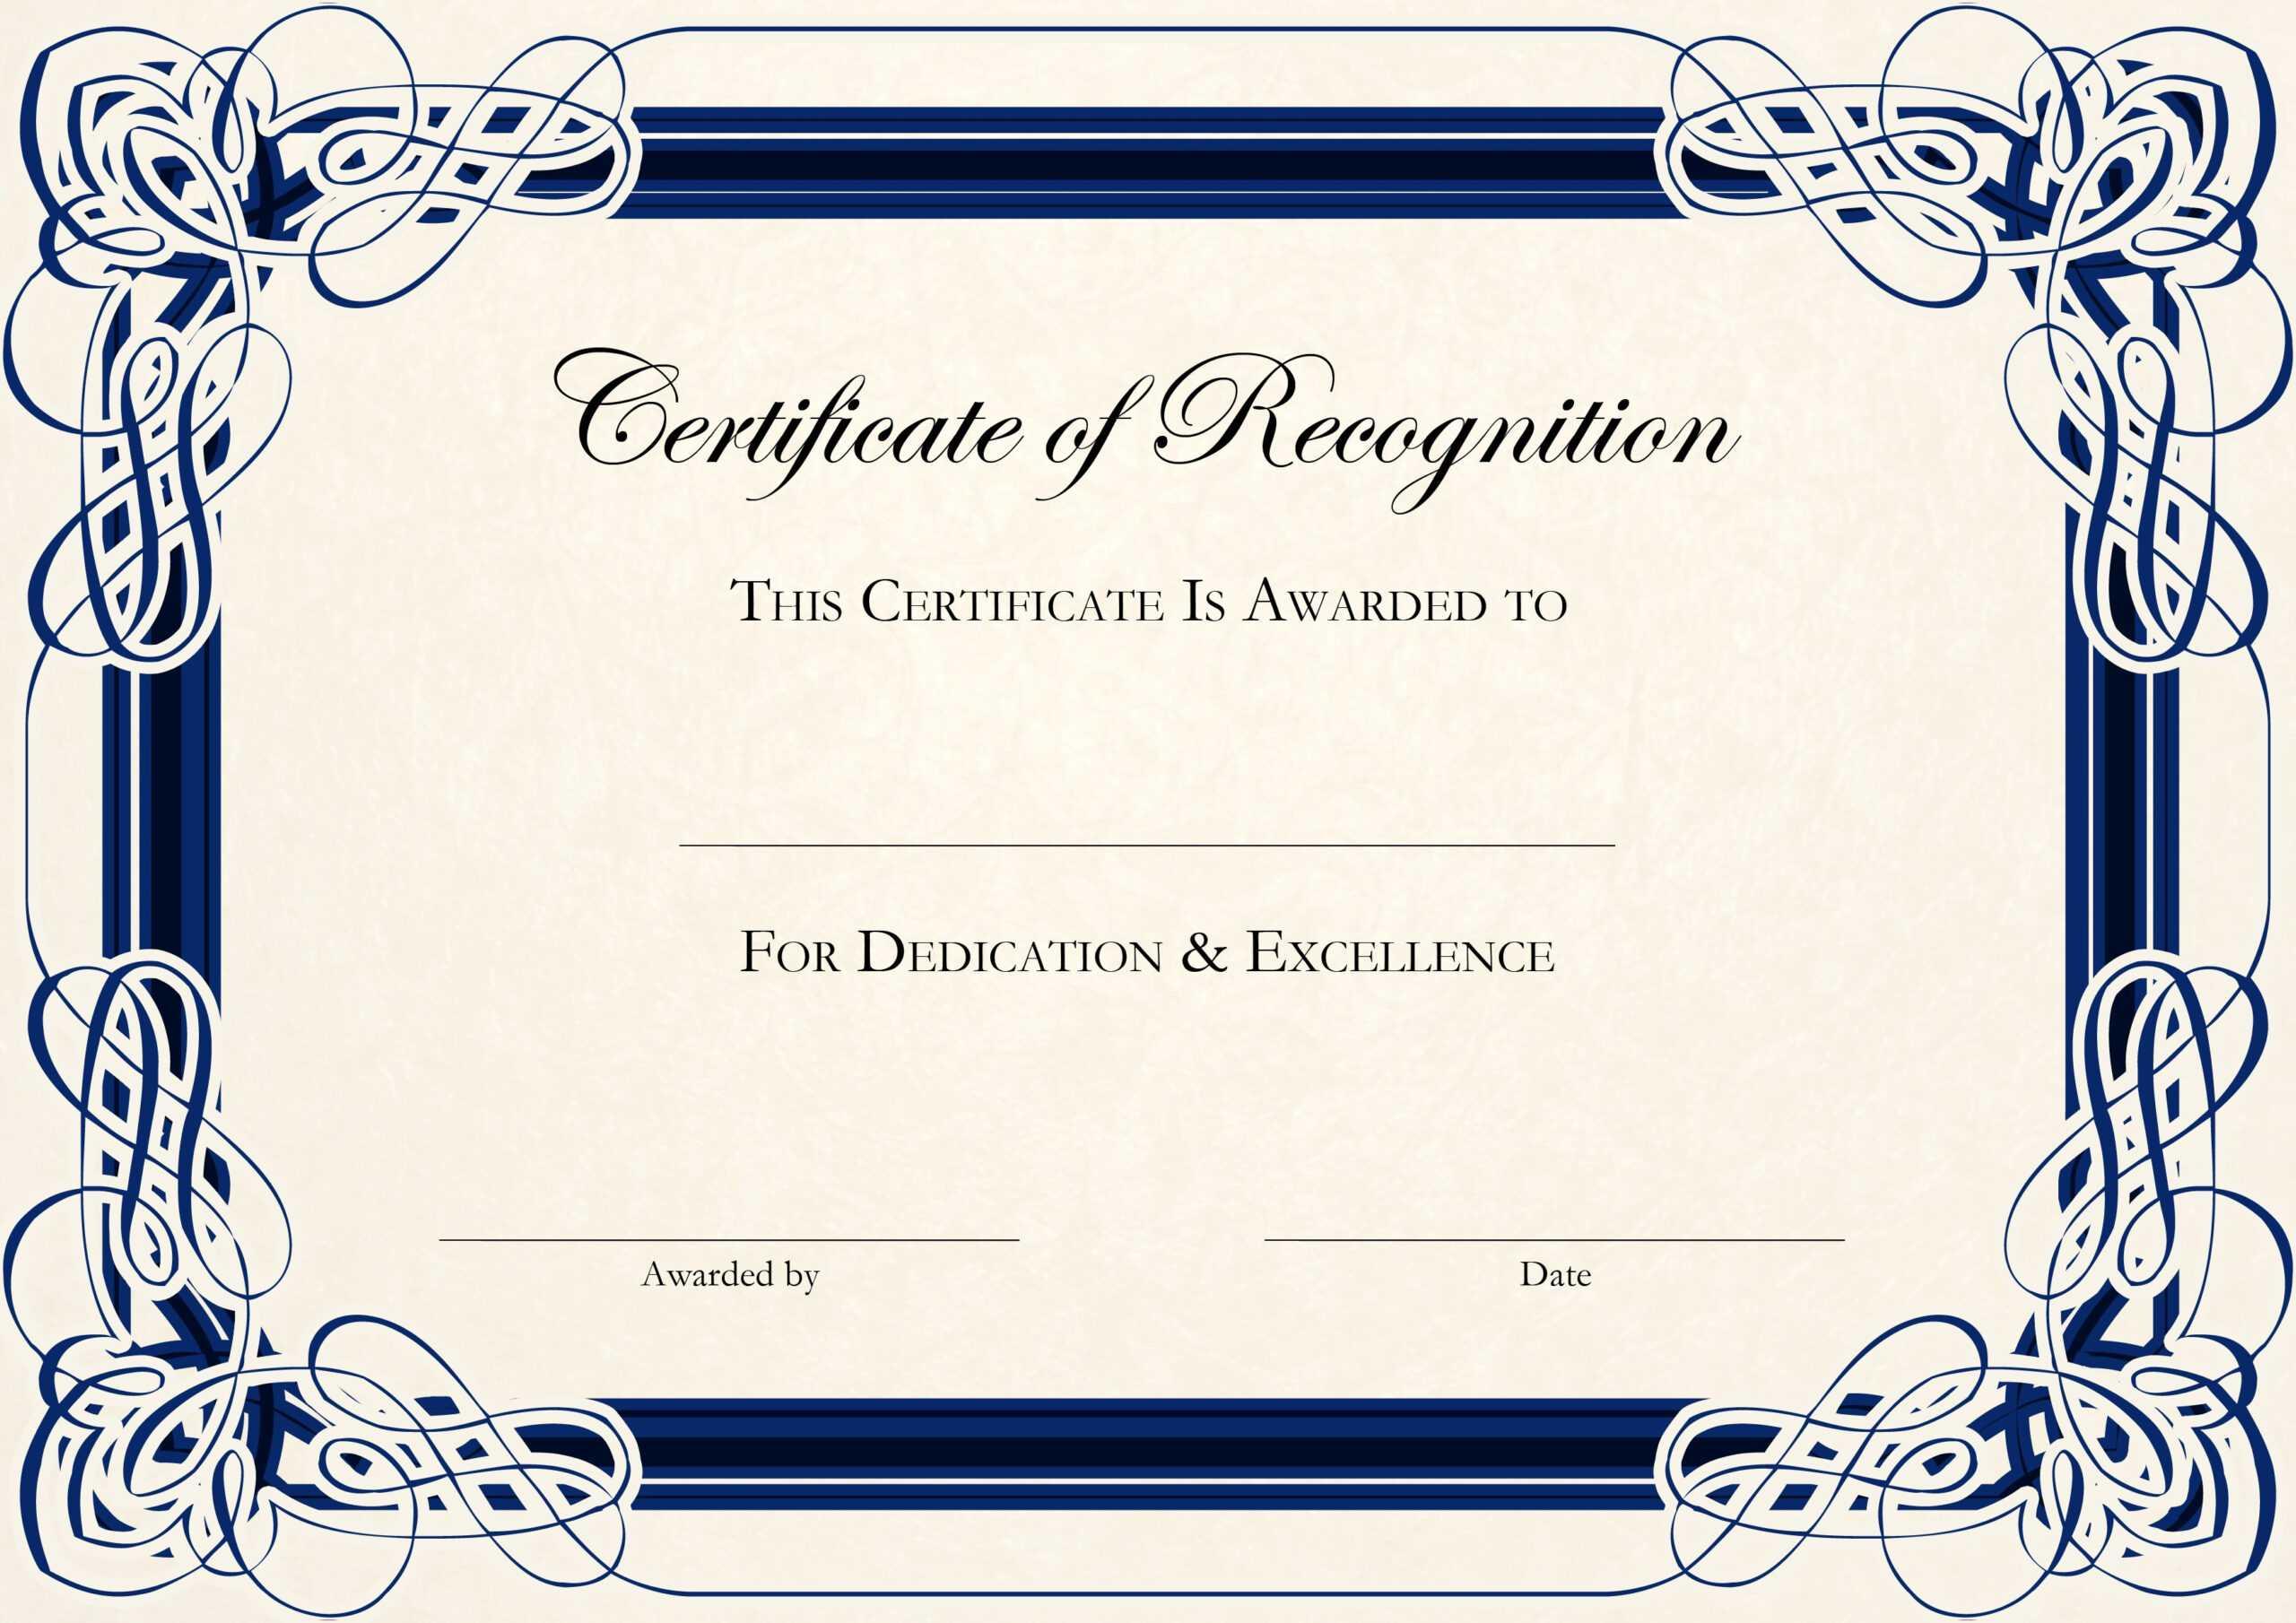 Free Certificate Templates For Word Regarding Certificate Templates For Word Free Downloads